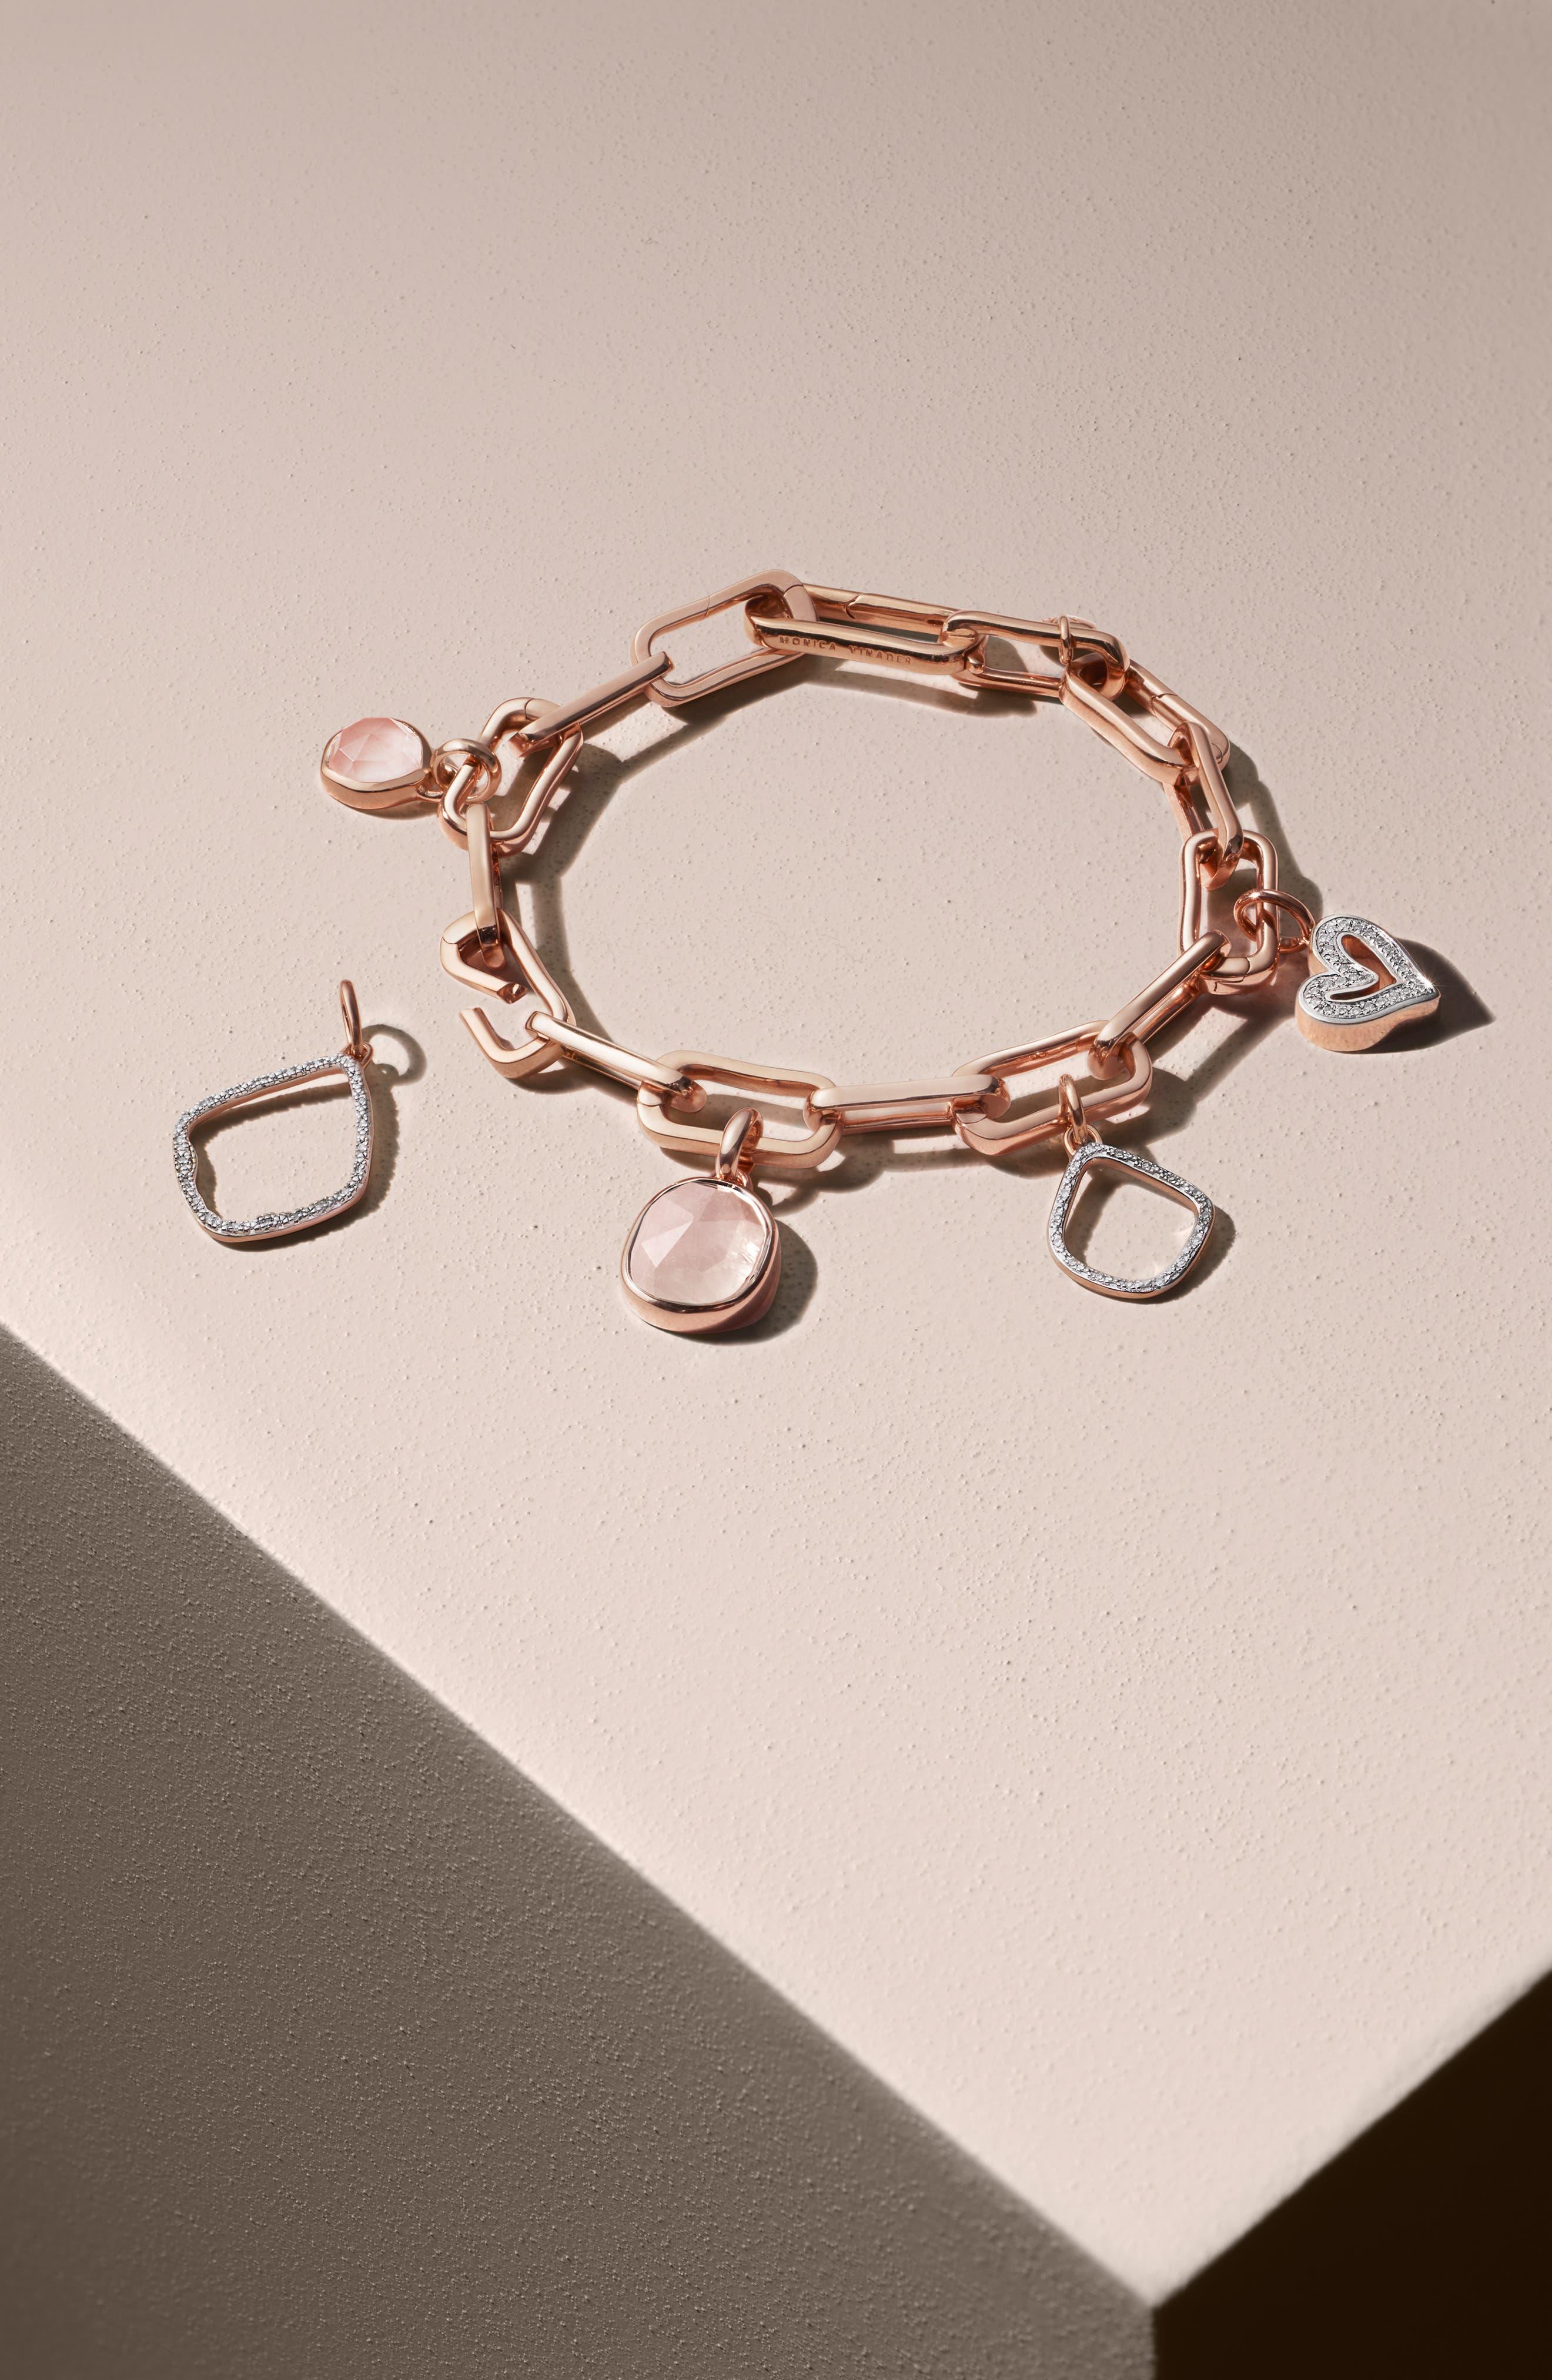 Alta Capture Link Chain Bracelet,                             Alternate thumbnail 8, color,                             ROSE GOLD